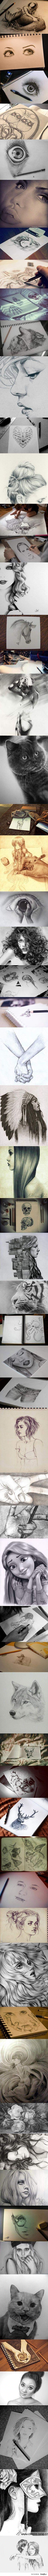 Amazing drawings!